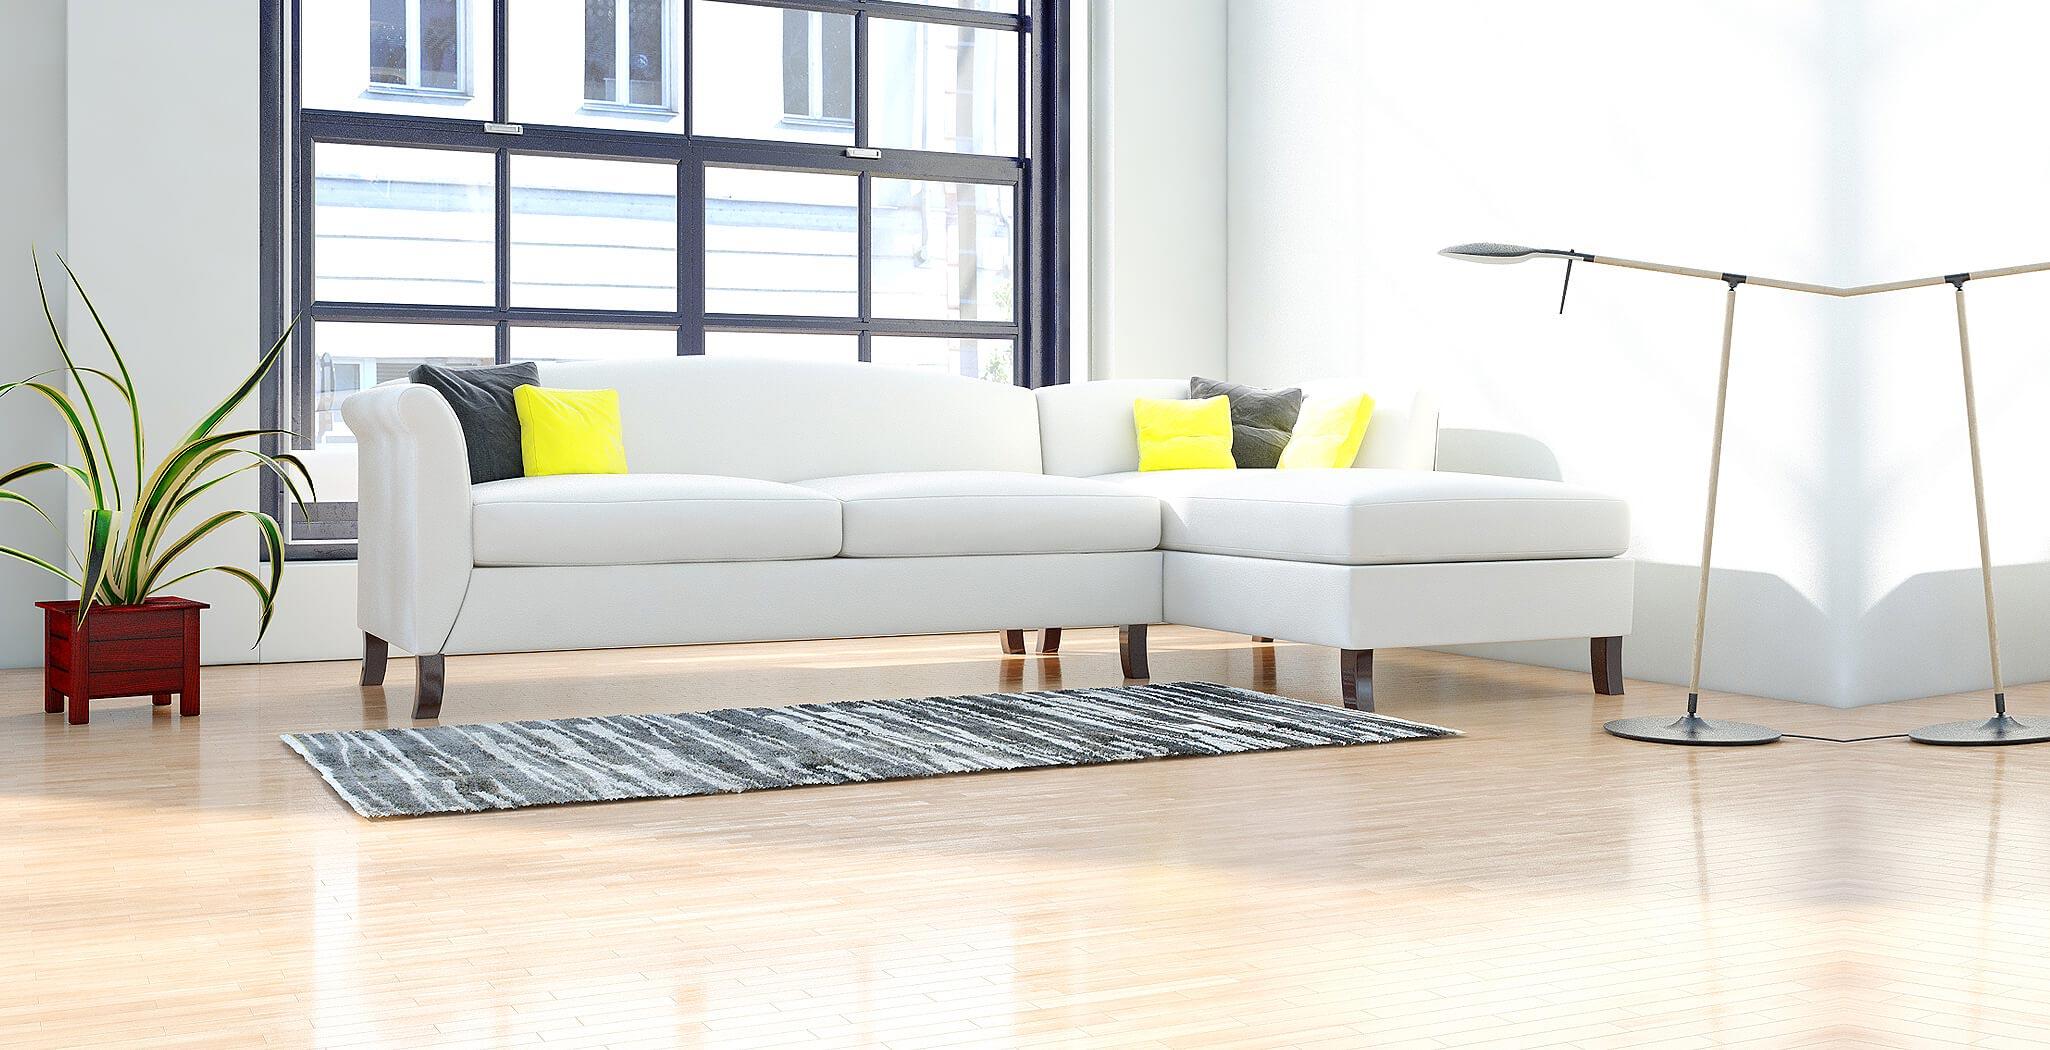 crete panel furniture gallery 2